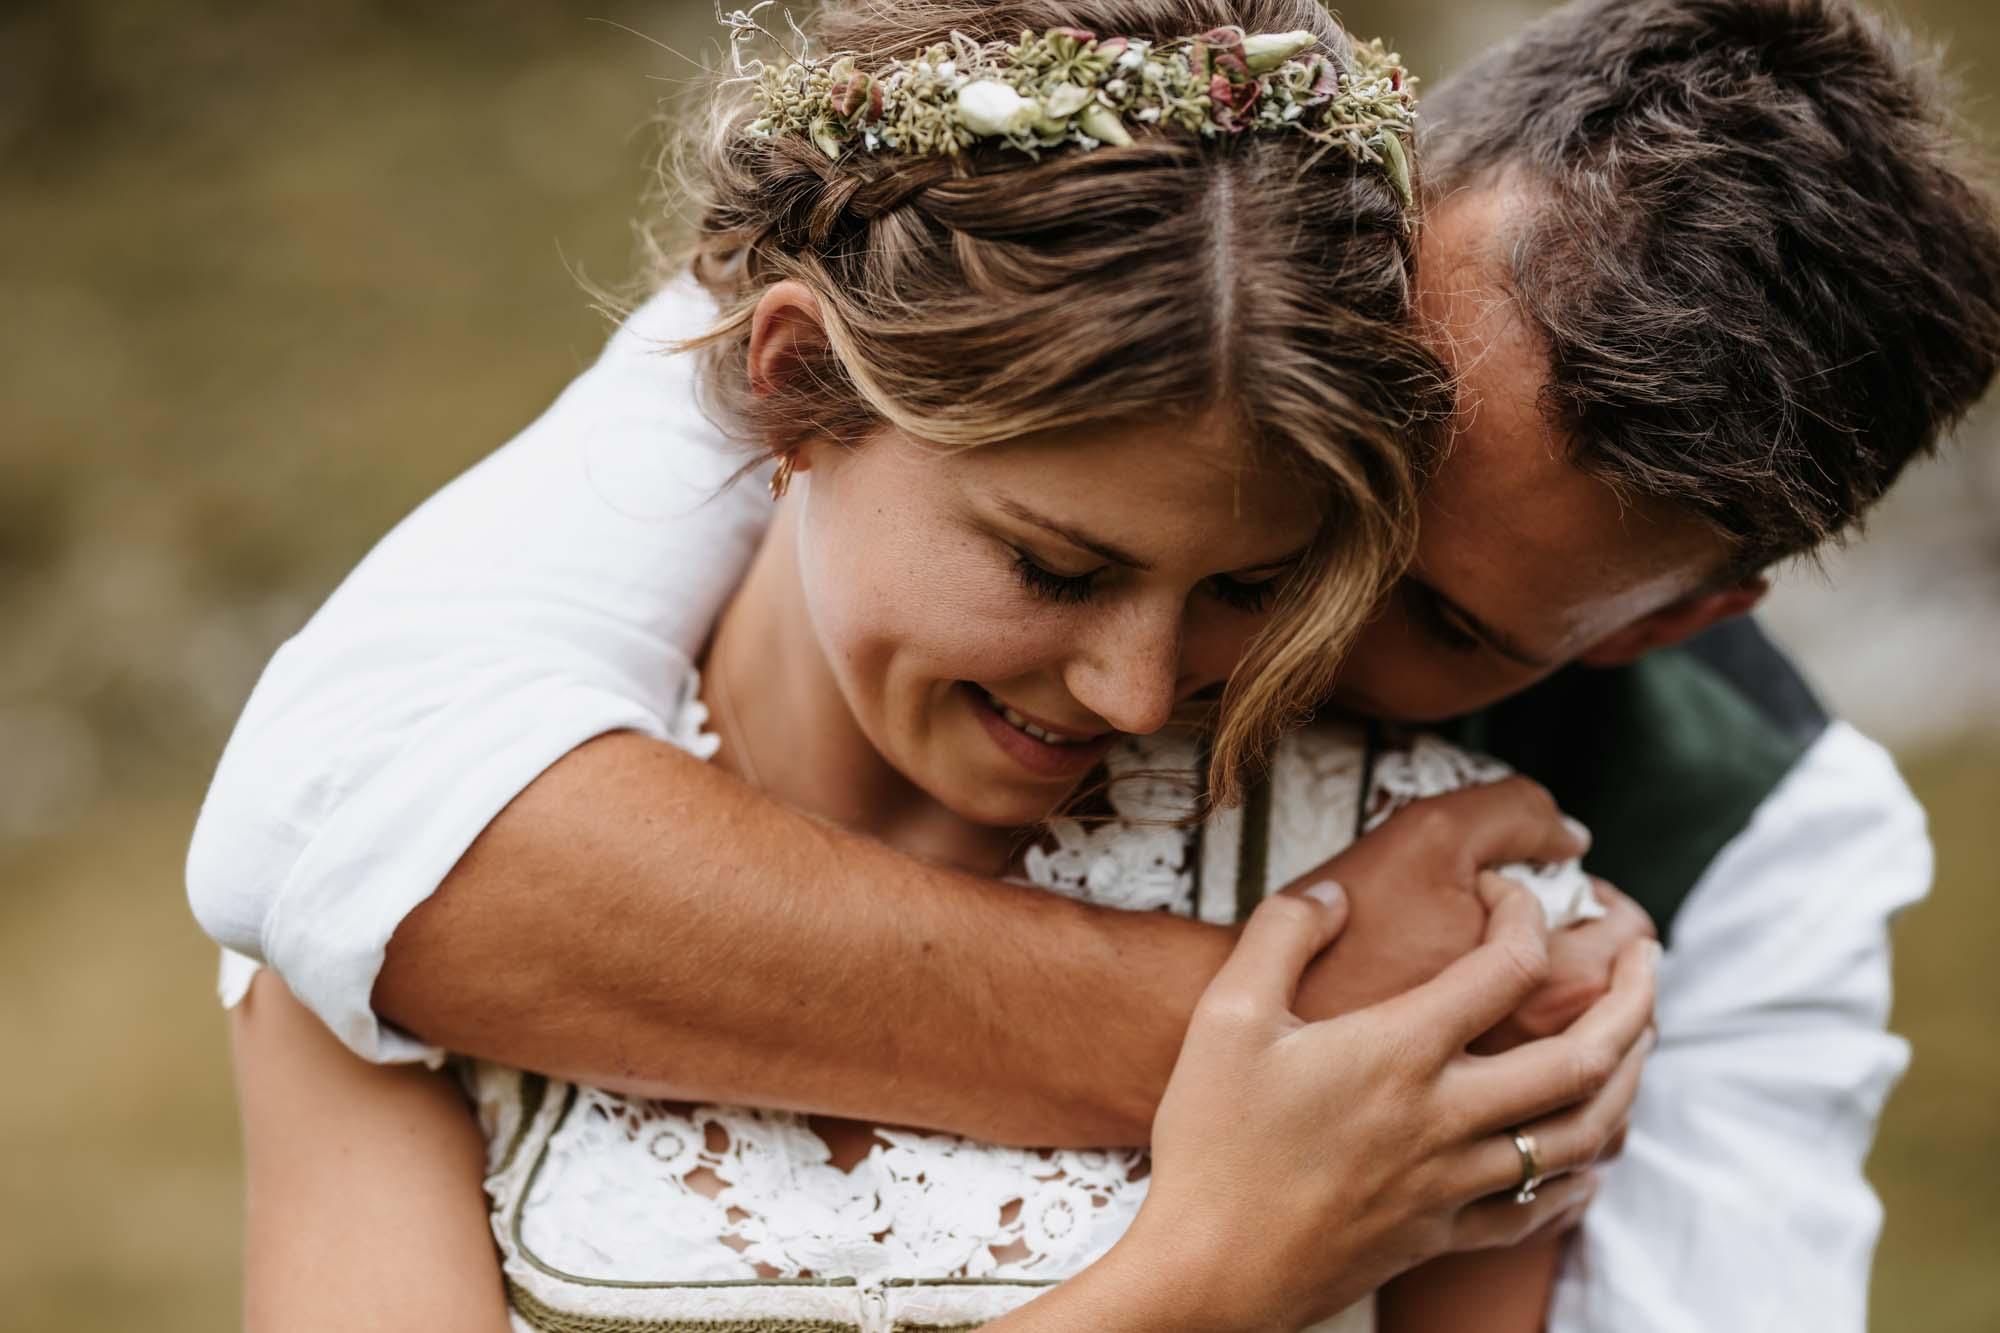 Helikopterflug, Hochzeit, Heiraten Zell am See, Heiraten Maria Alm